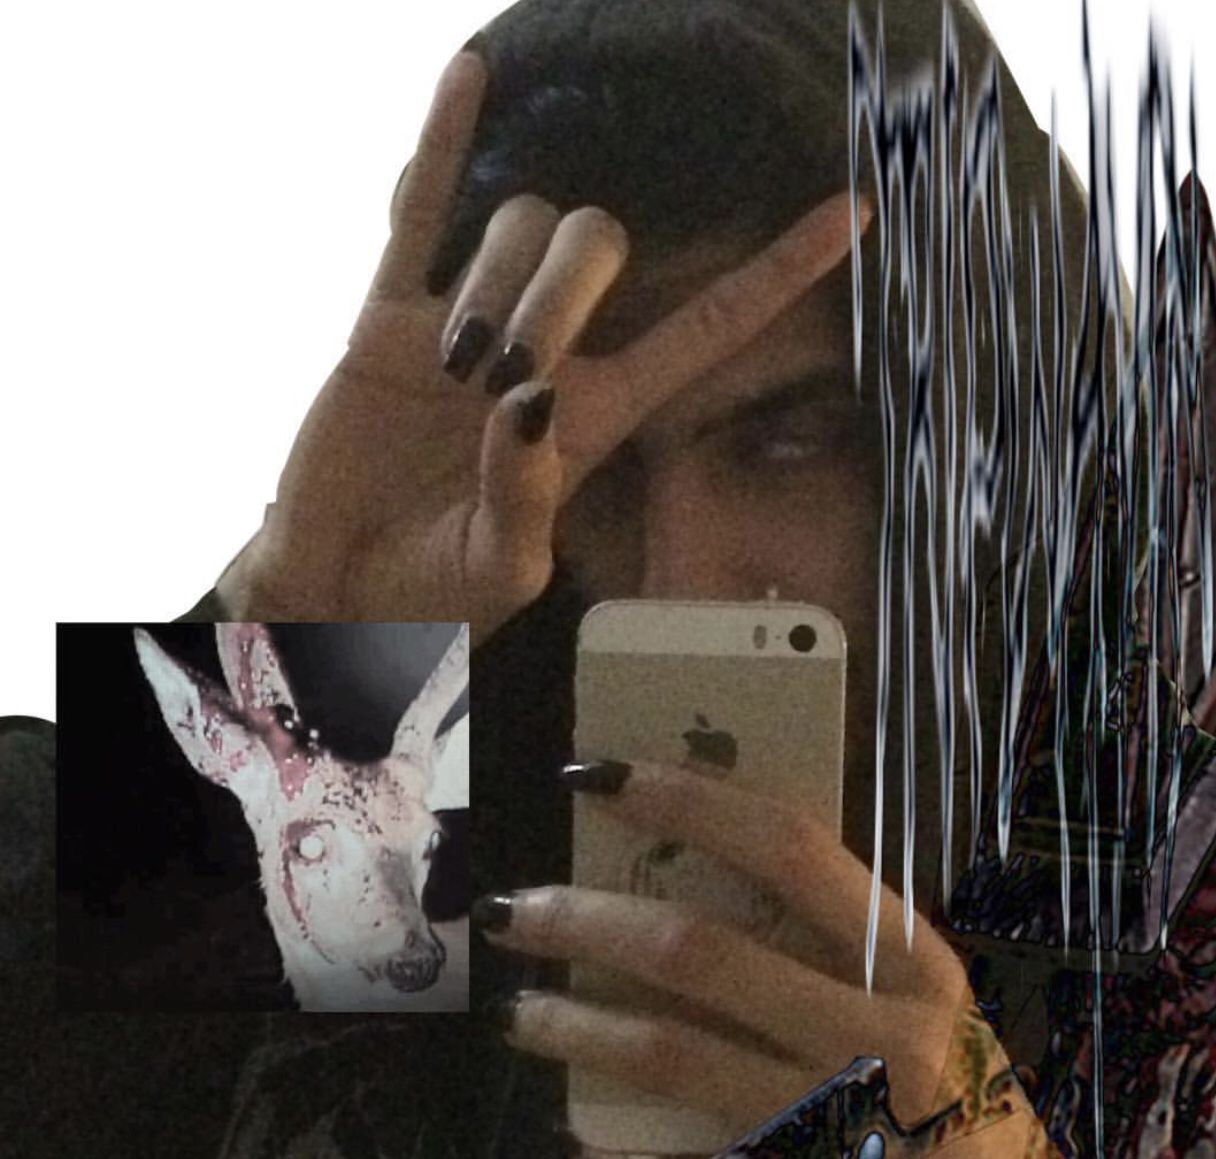 Pin by 𝕮𝖍𝖆𝖘𝖊 on Boys Grunge guys, Demon aesthetic